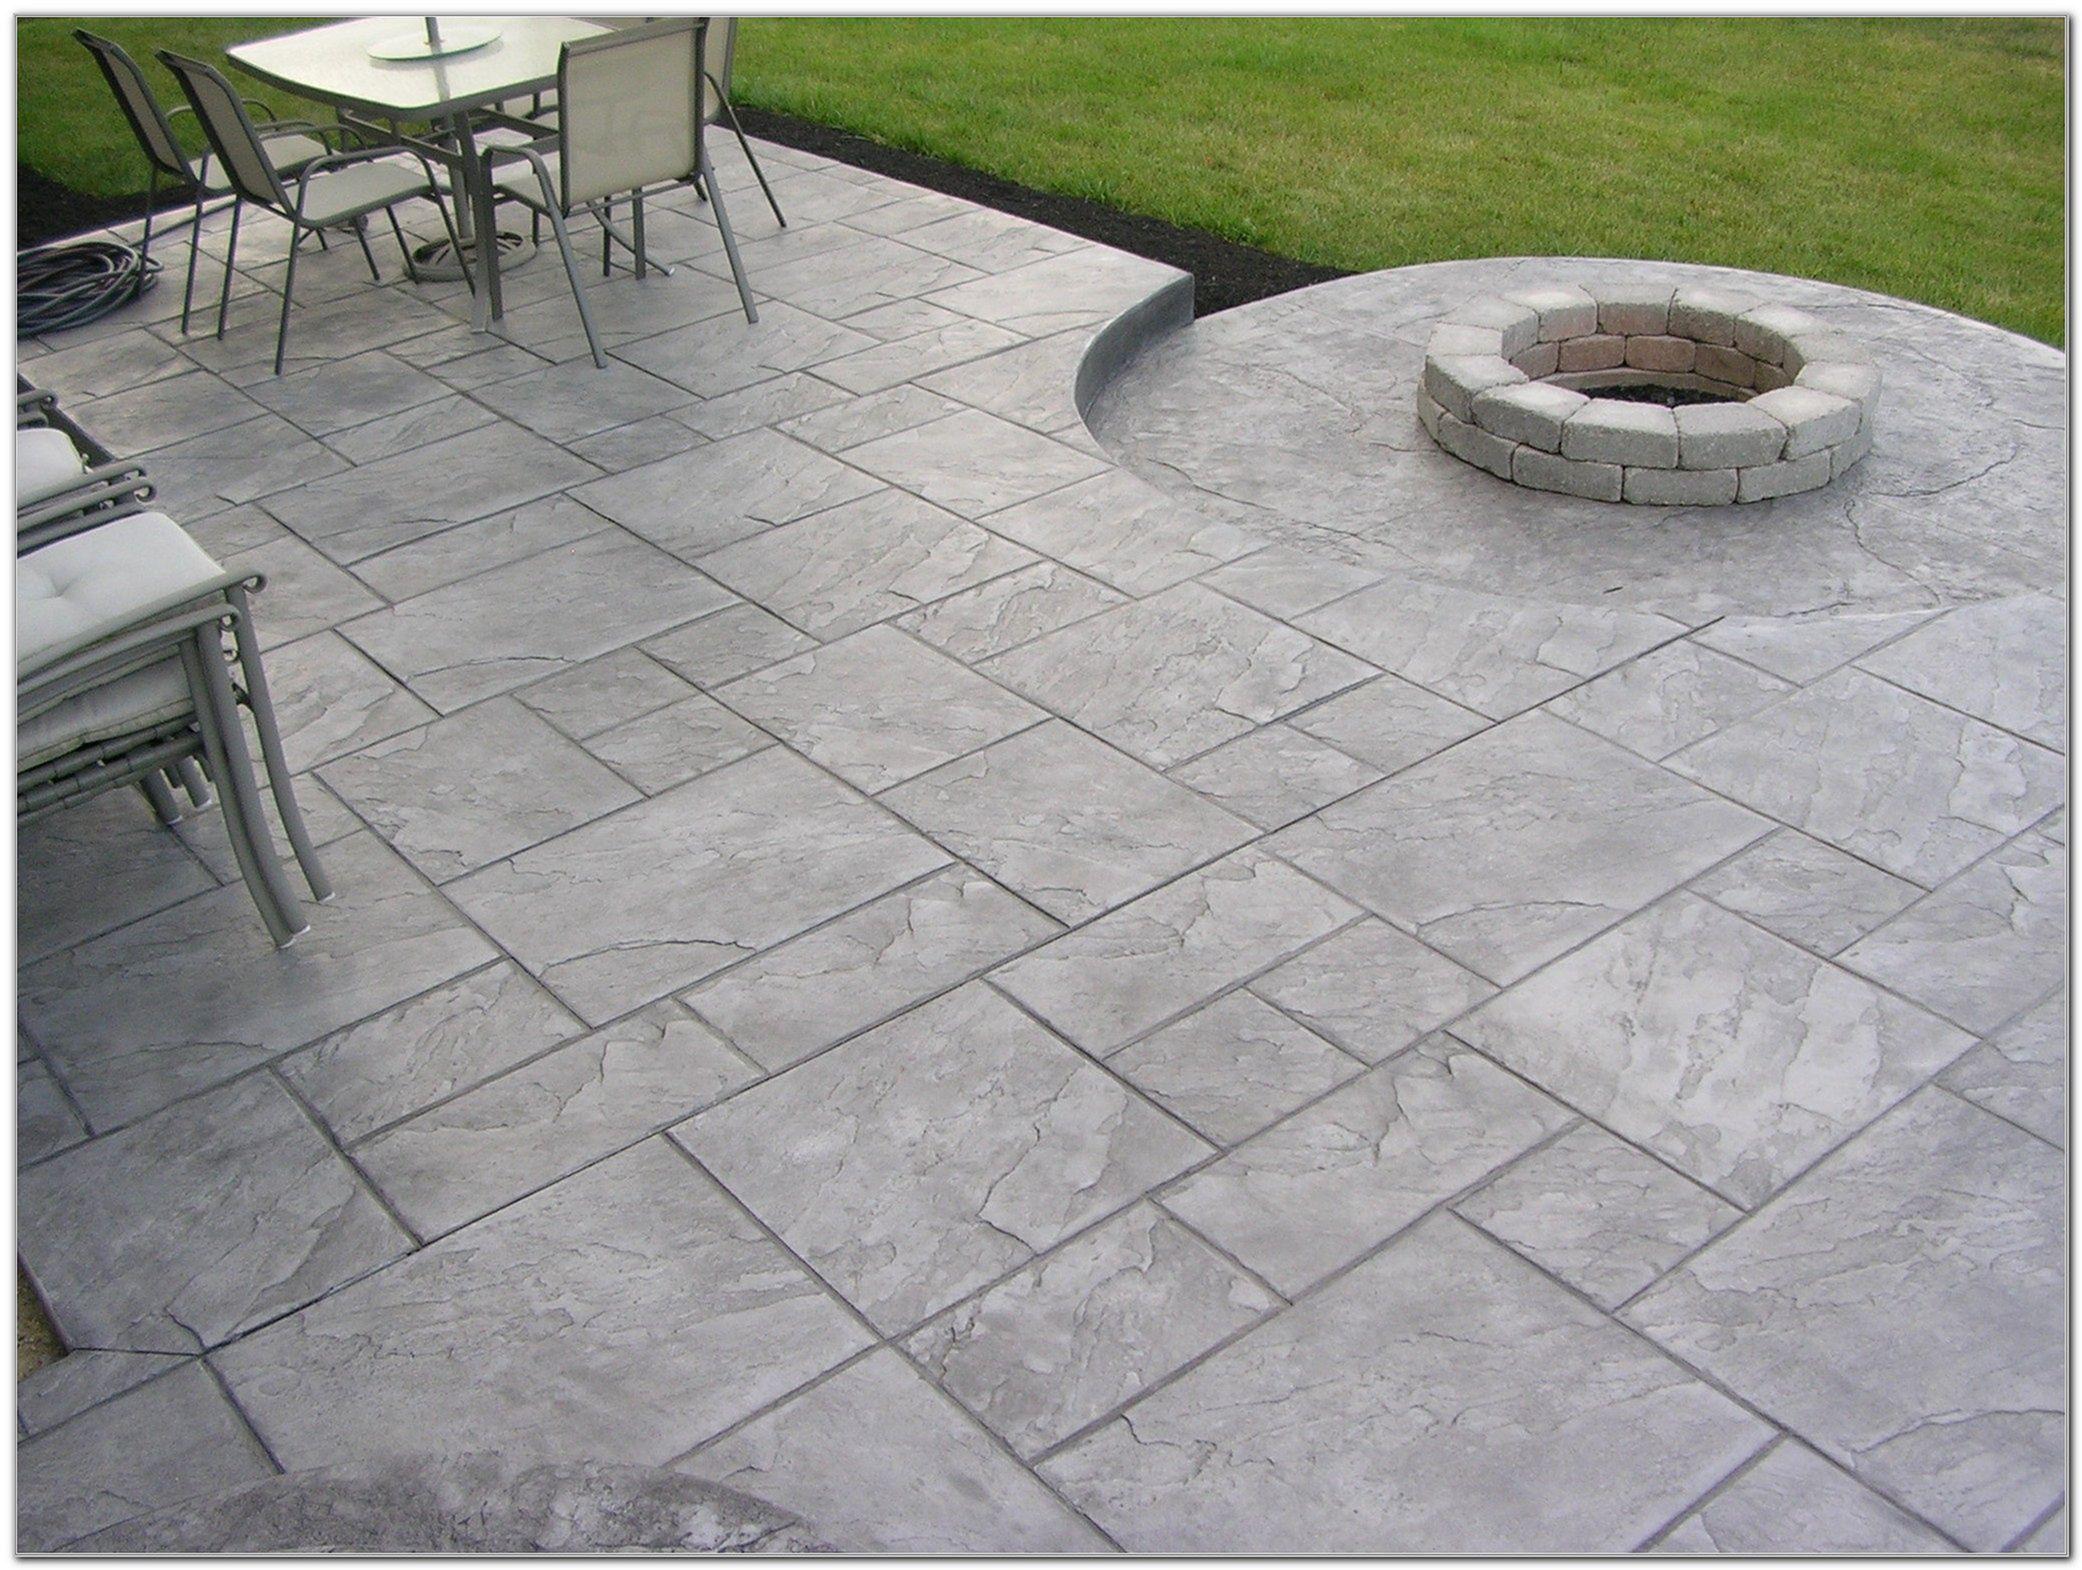 Textured Concrete Patio Designs. Unique Concrete Stamped Concrete Patio  Designs Idea Intended Textured E